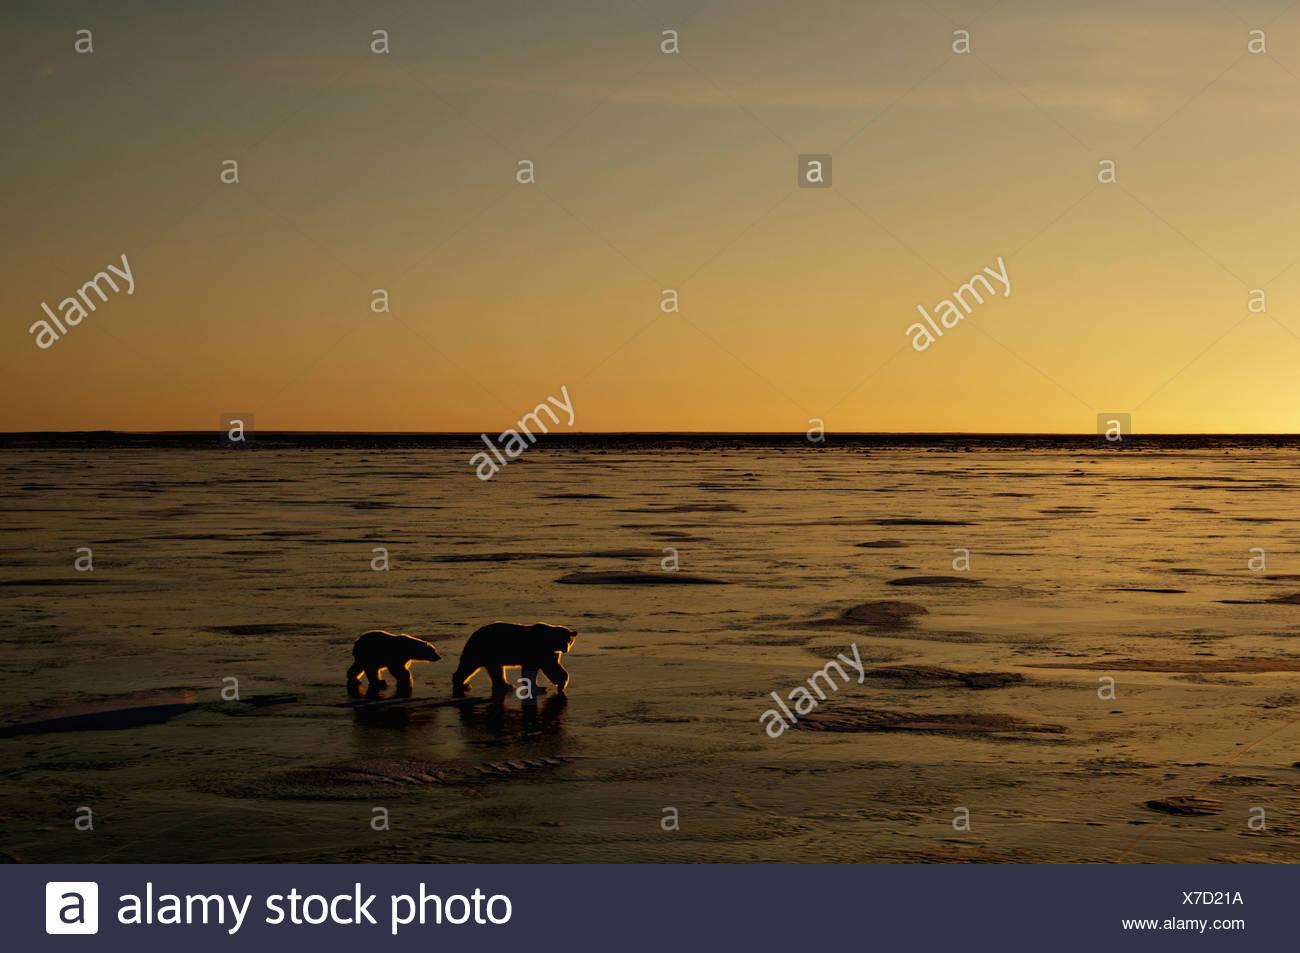 Polar bears in the wild - Stock Image